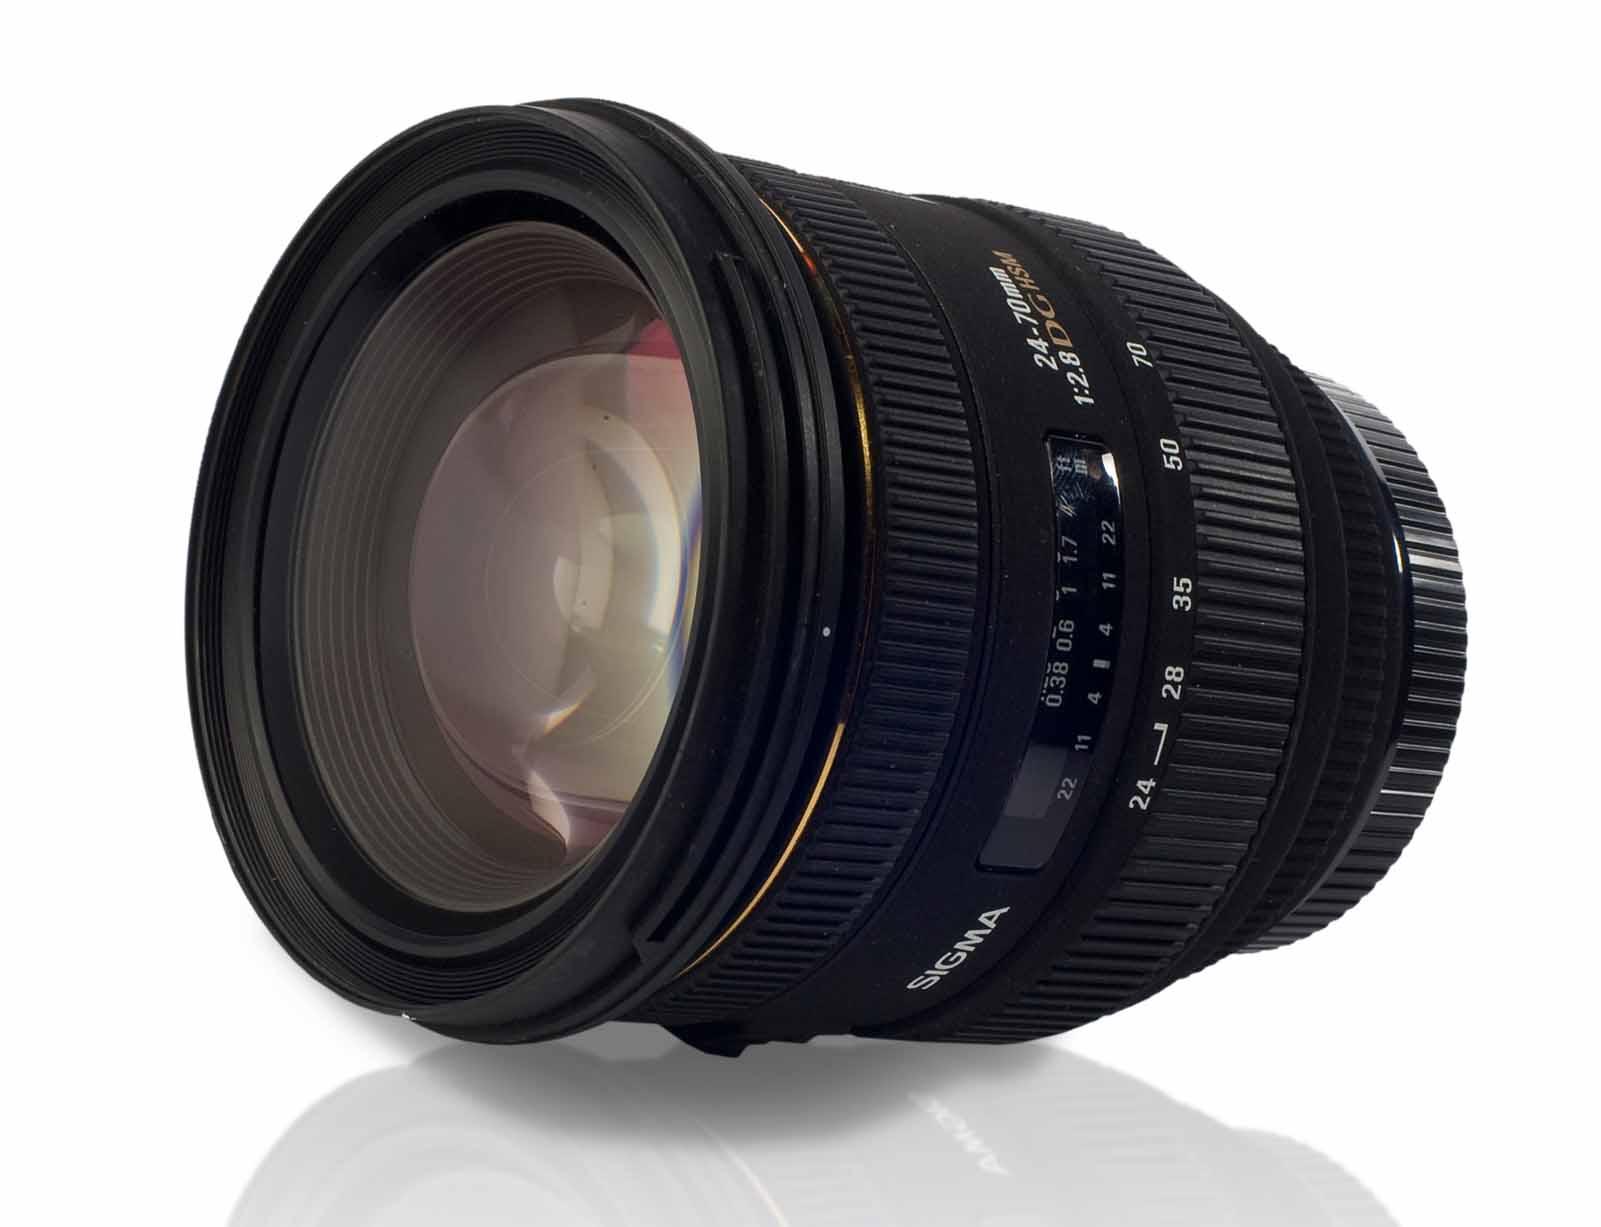 sigma 24 70mm f28 - photo #9